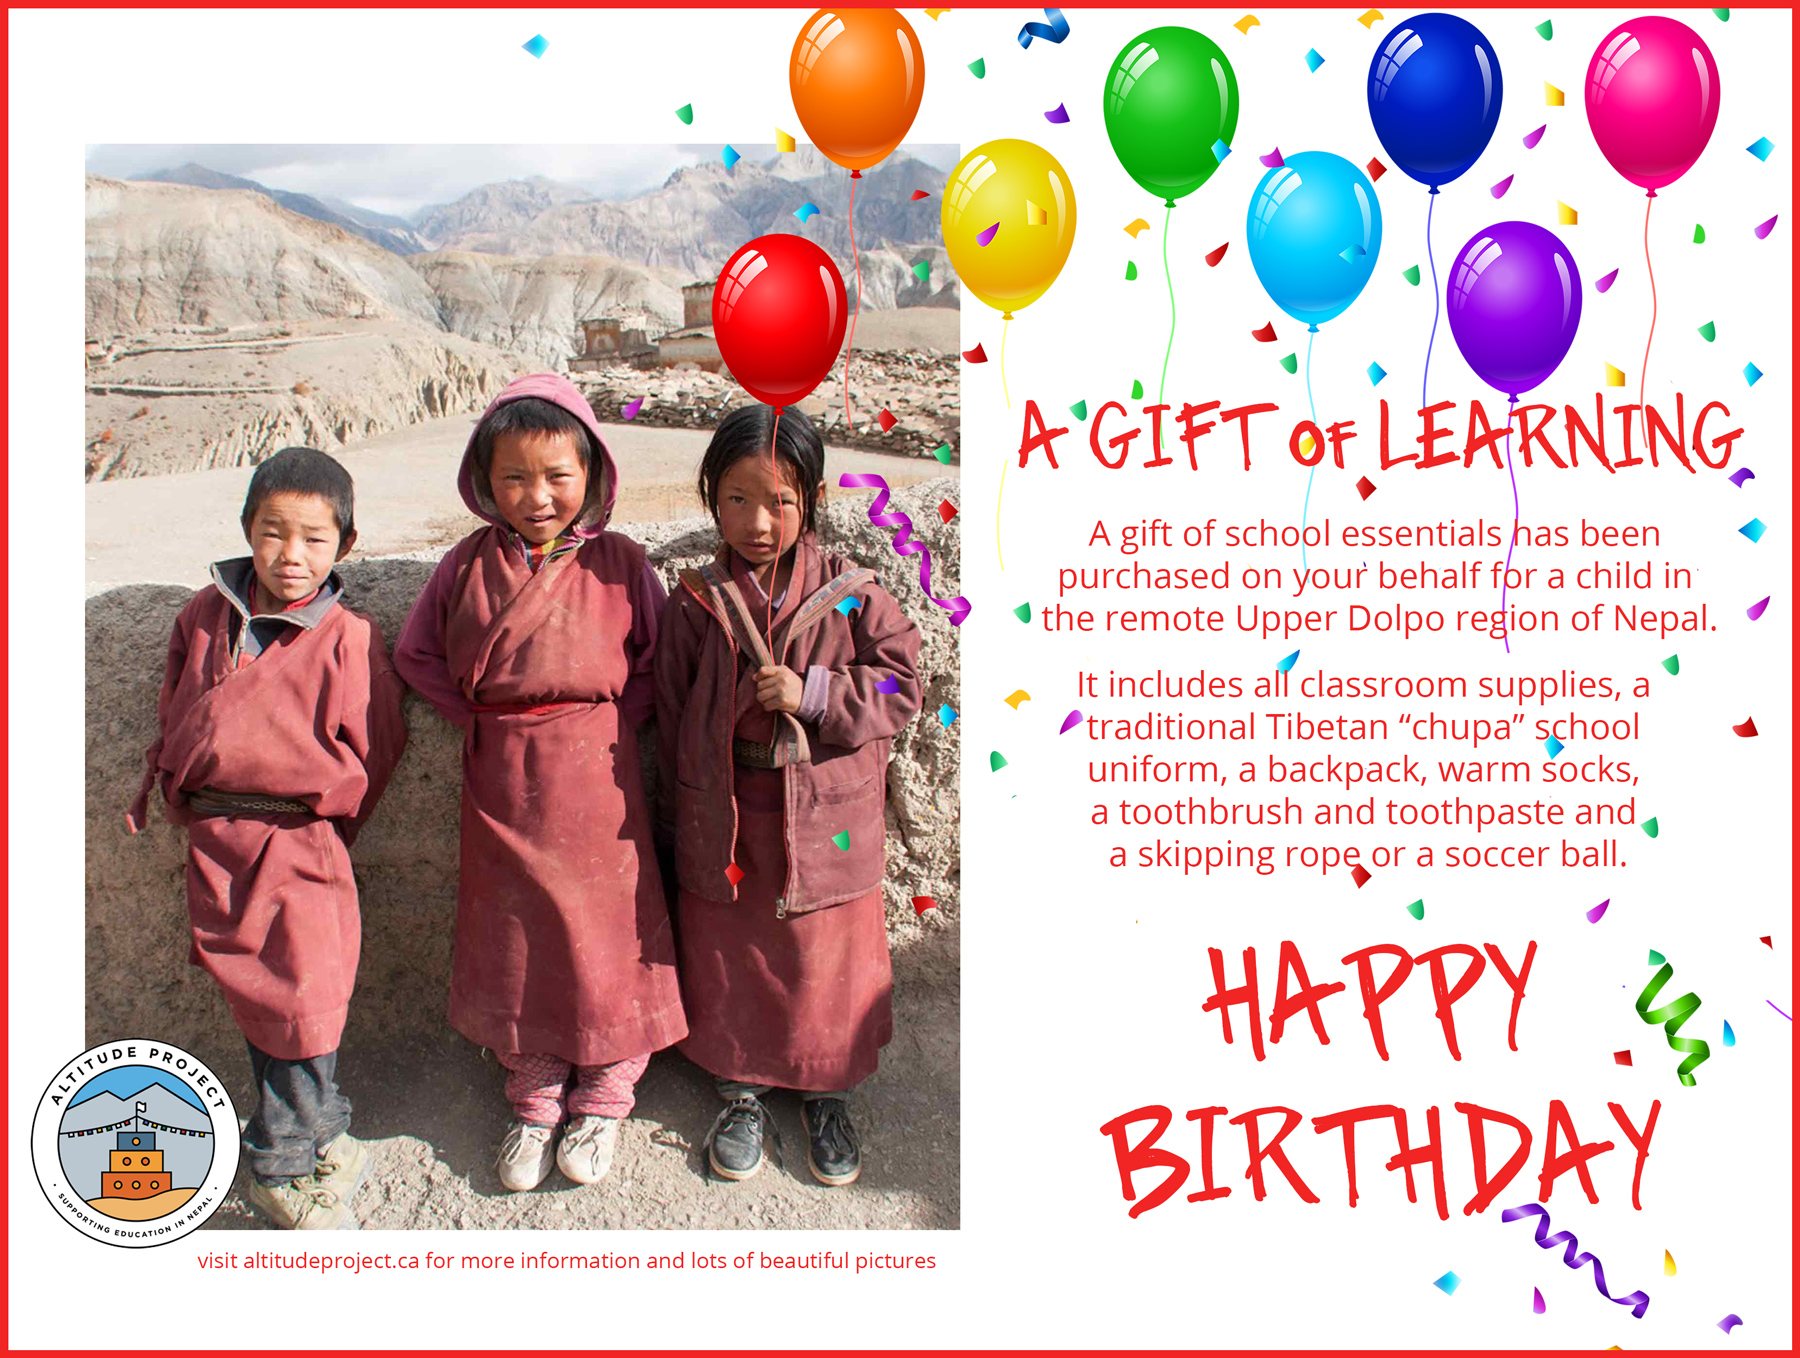 Happy-Birthday---Altitude-Project--1800-1358